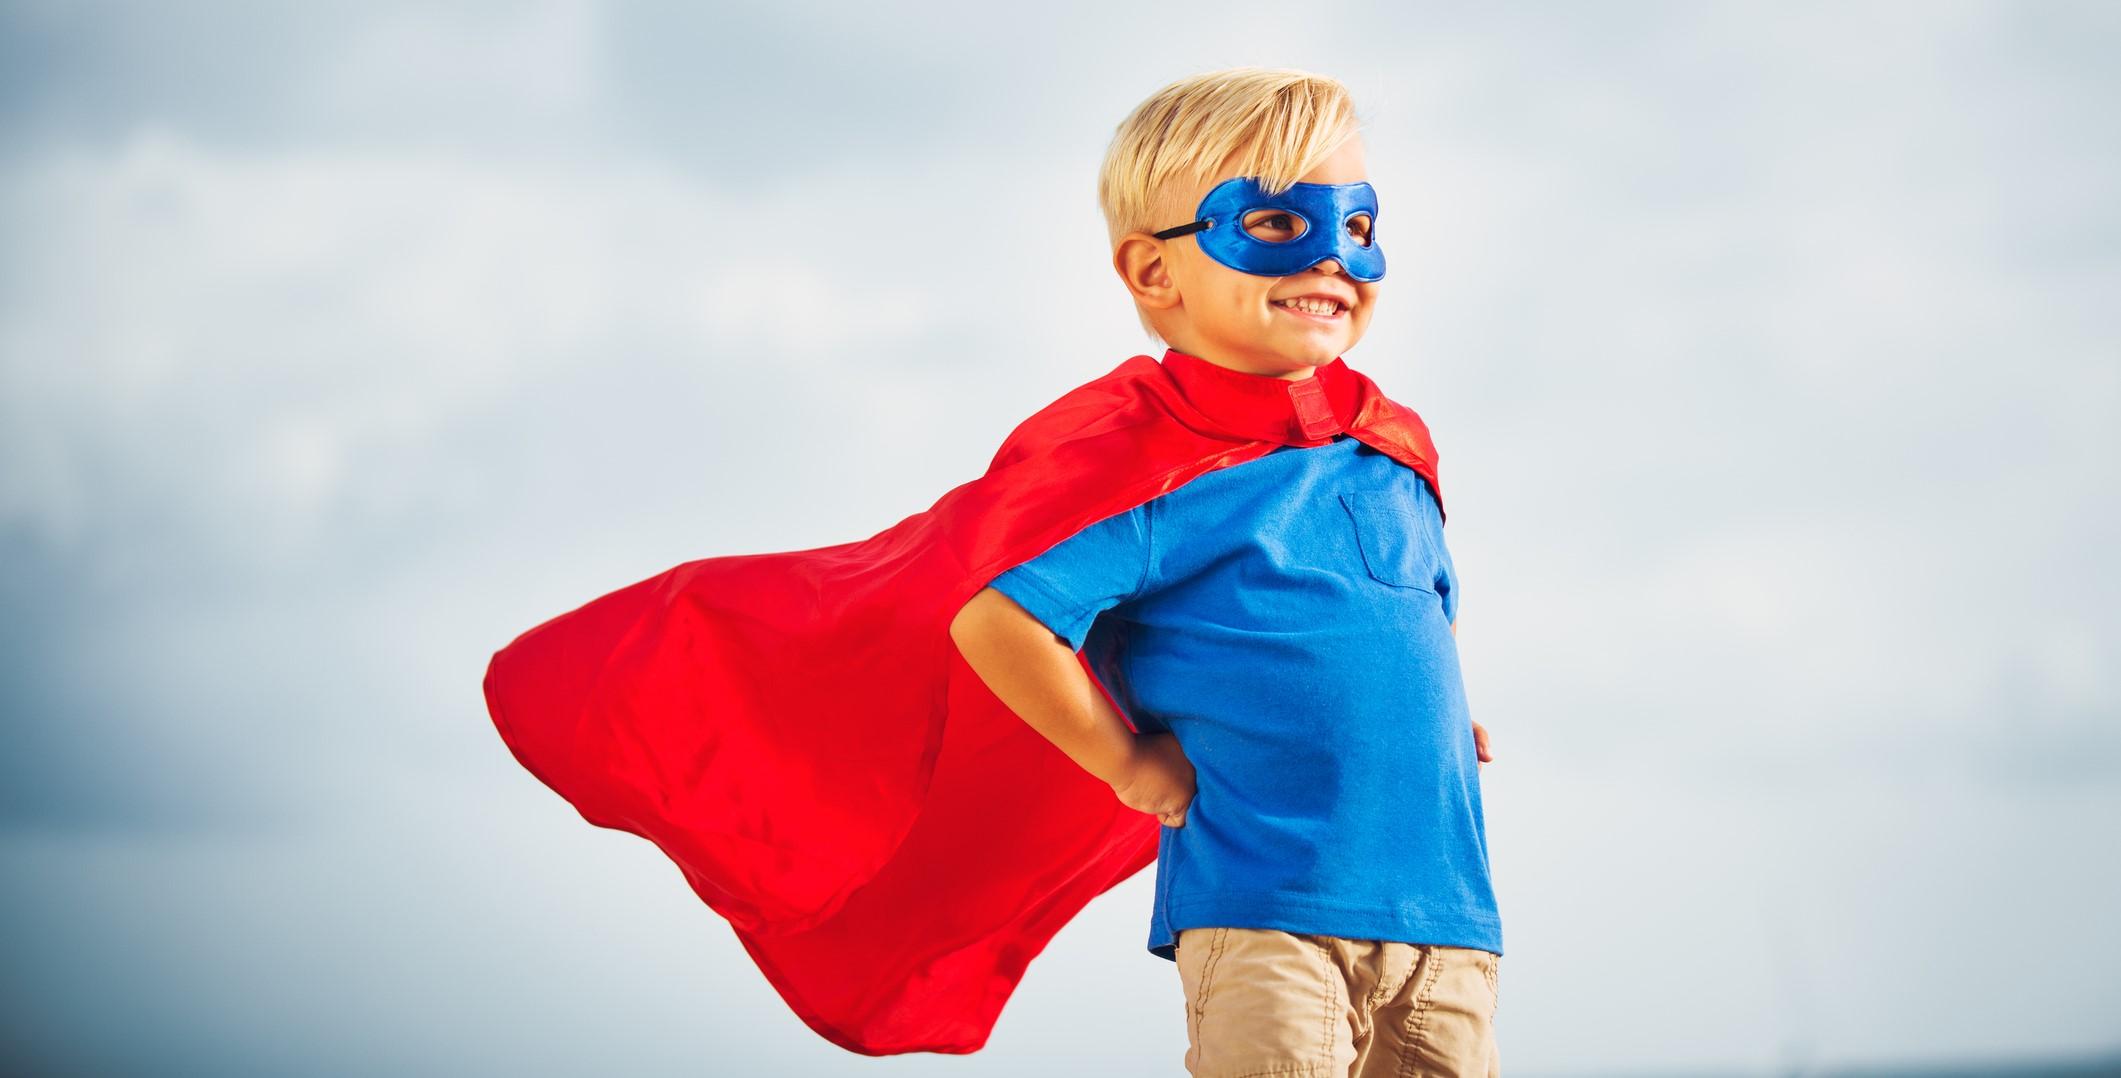 super hero kid cape mask dreamstime_m_54422654 - Job Crusher